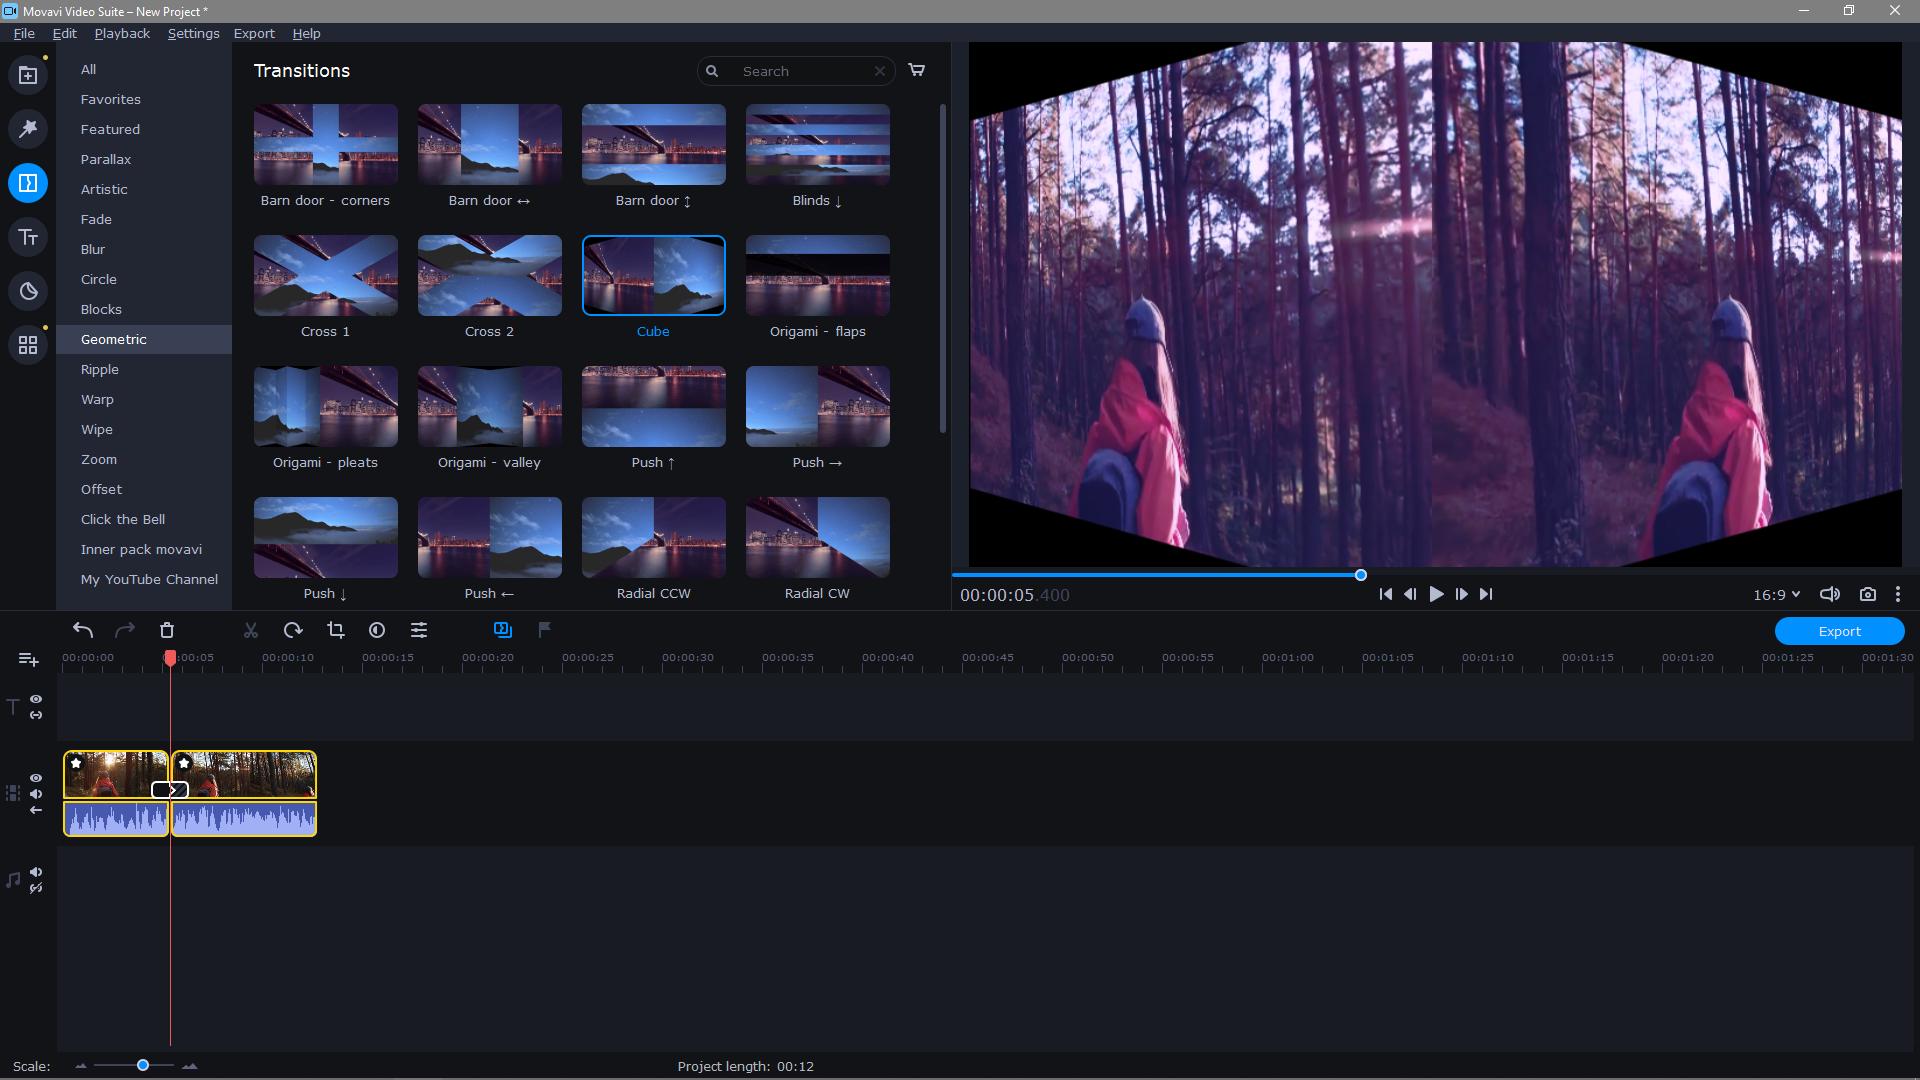 Movavi Video Editor Plus transition effects